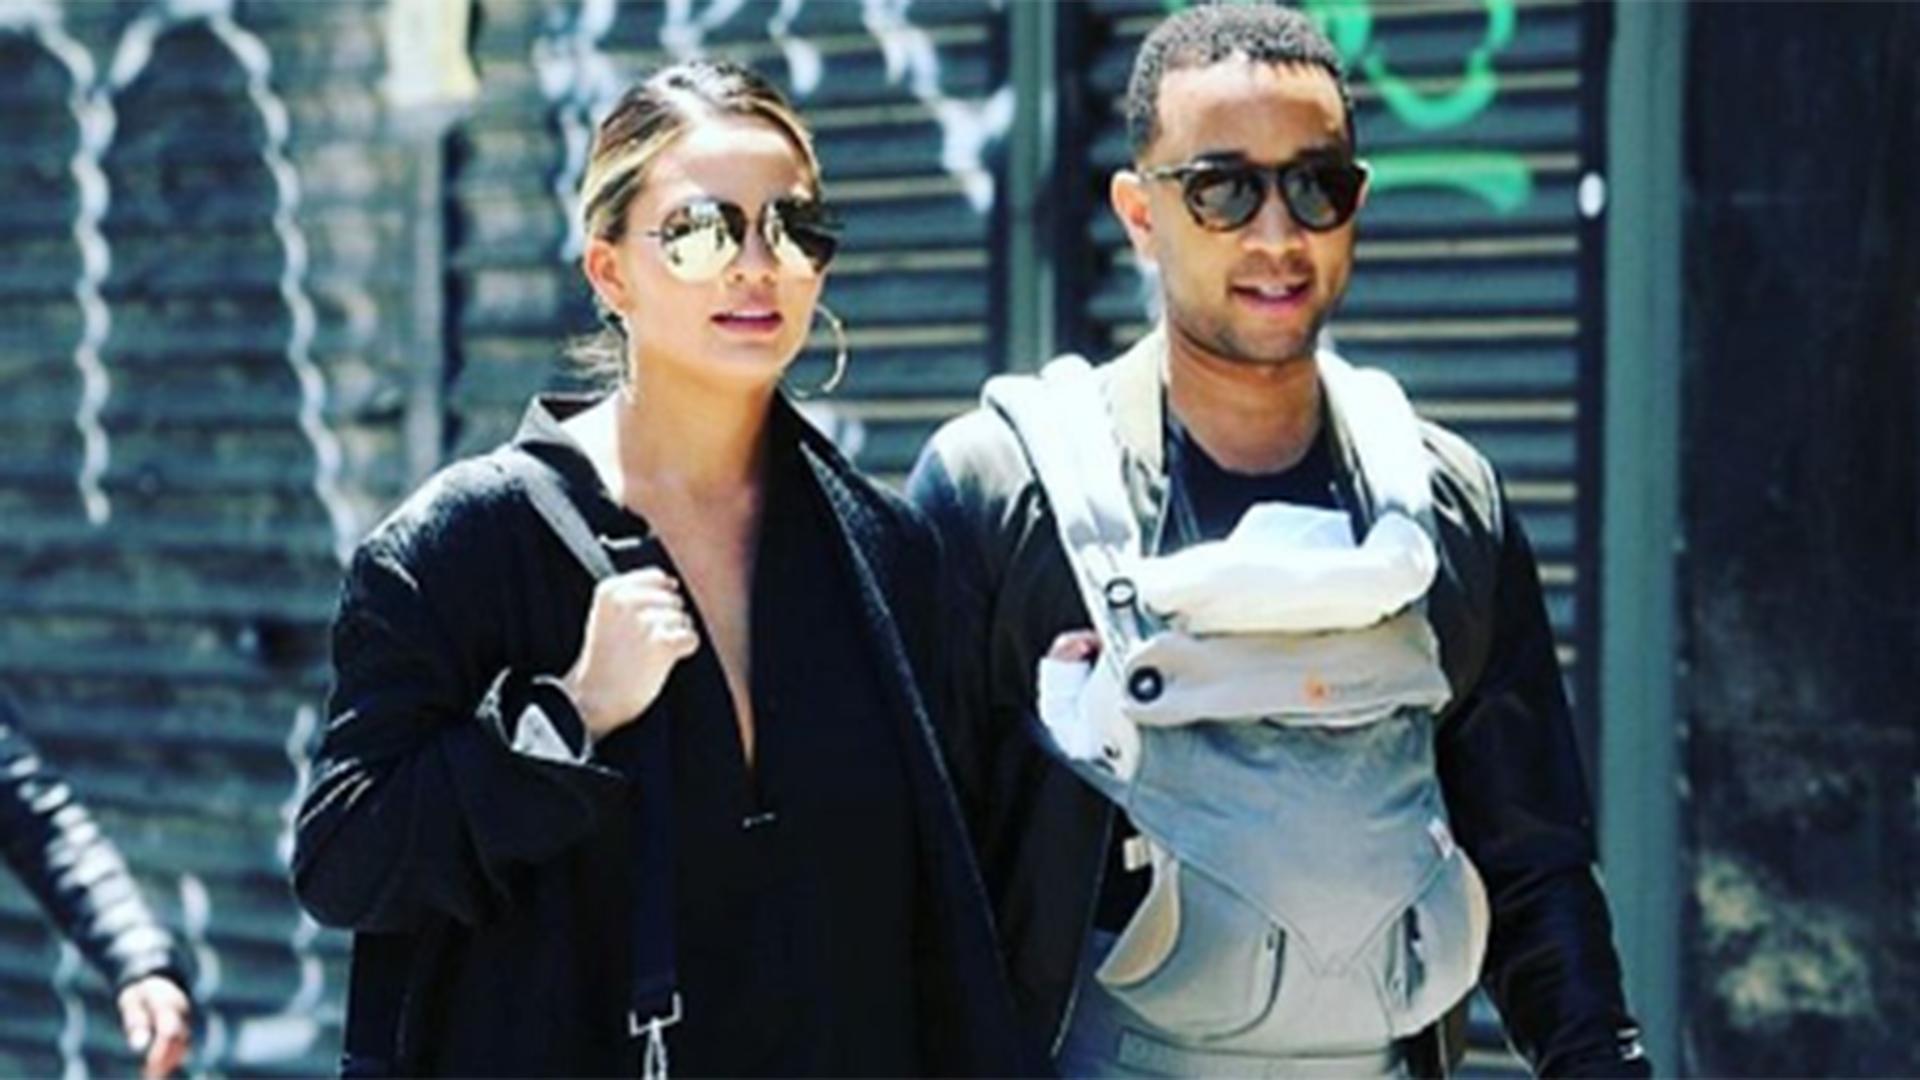 Chrissy Teigen shares sweet pic of baby Luna and husband John Legend on Instagram - TODAY.com